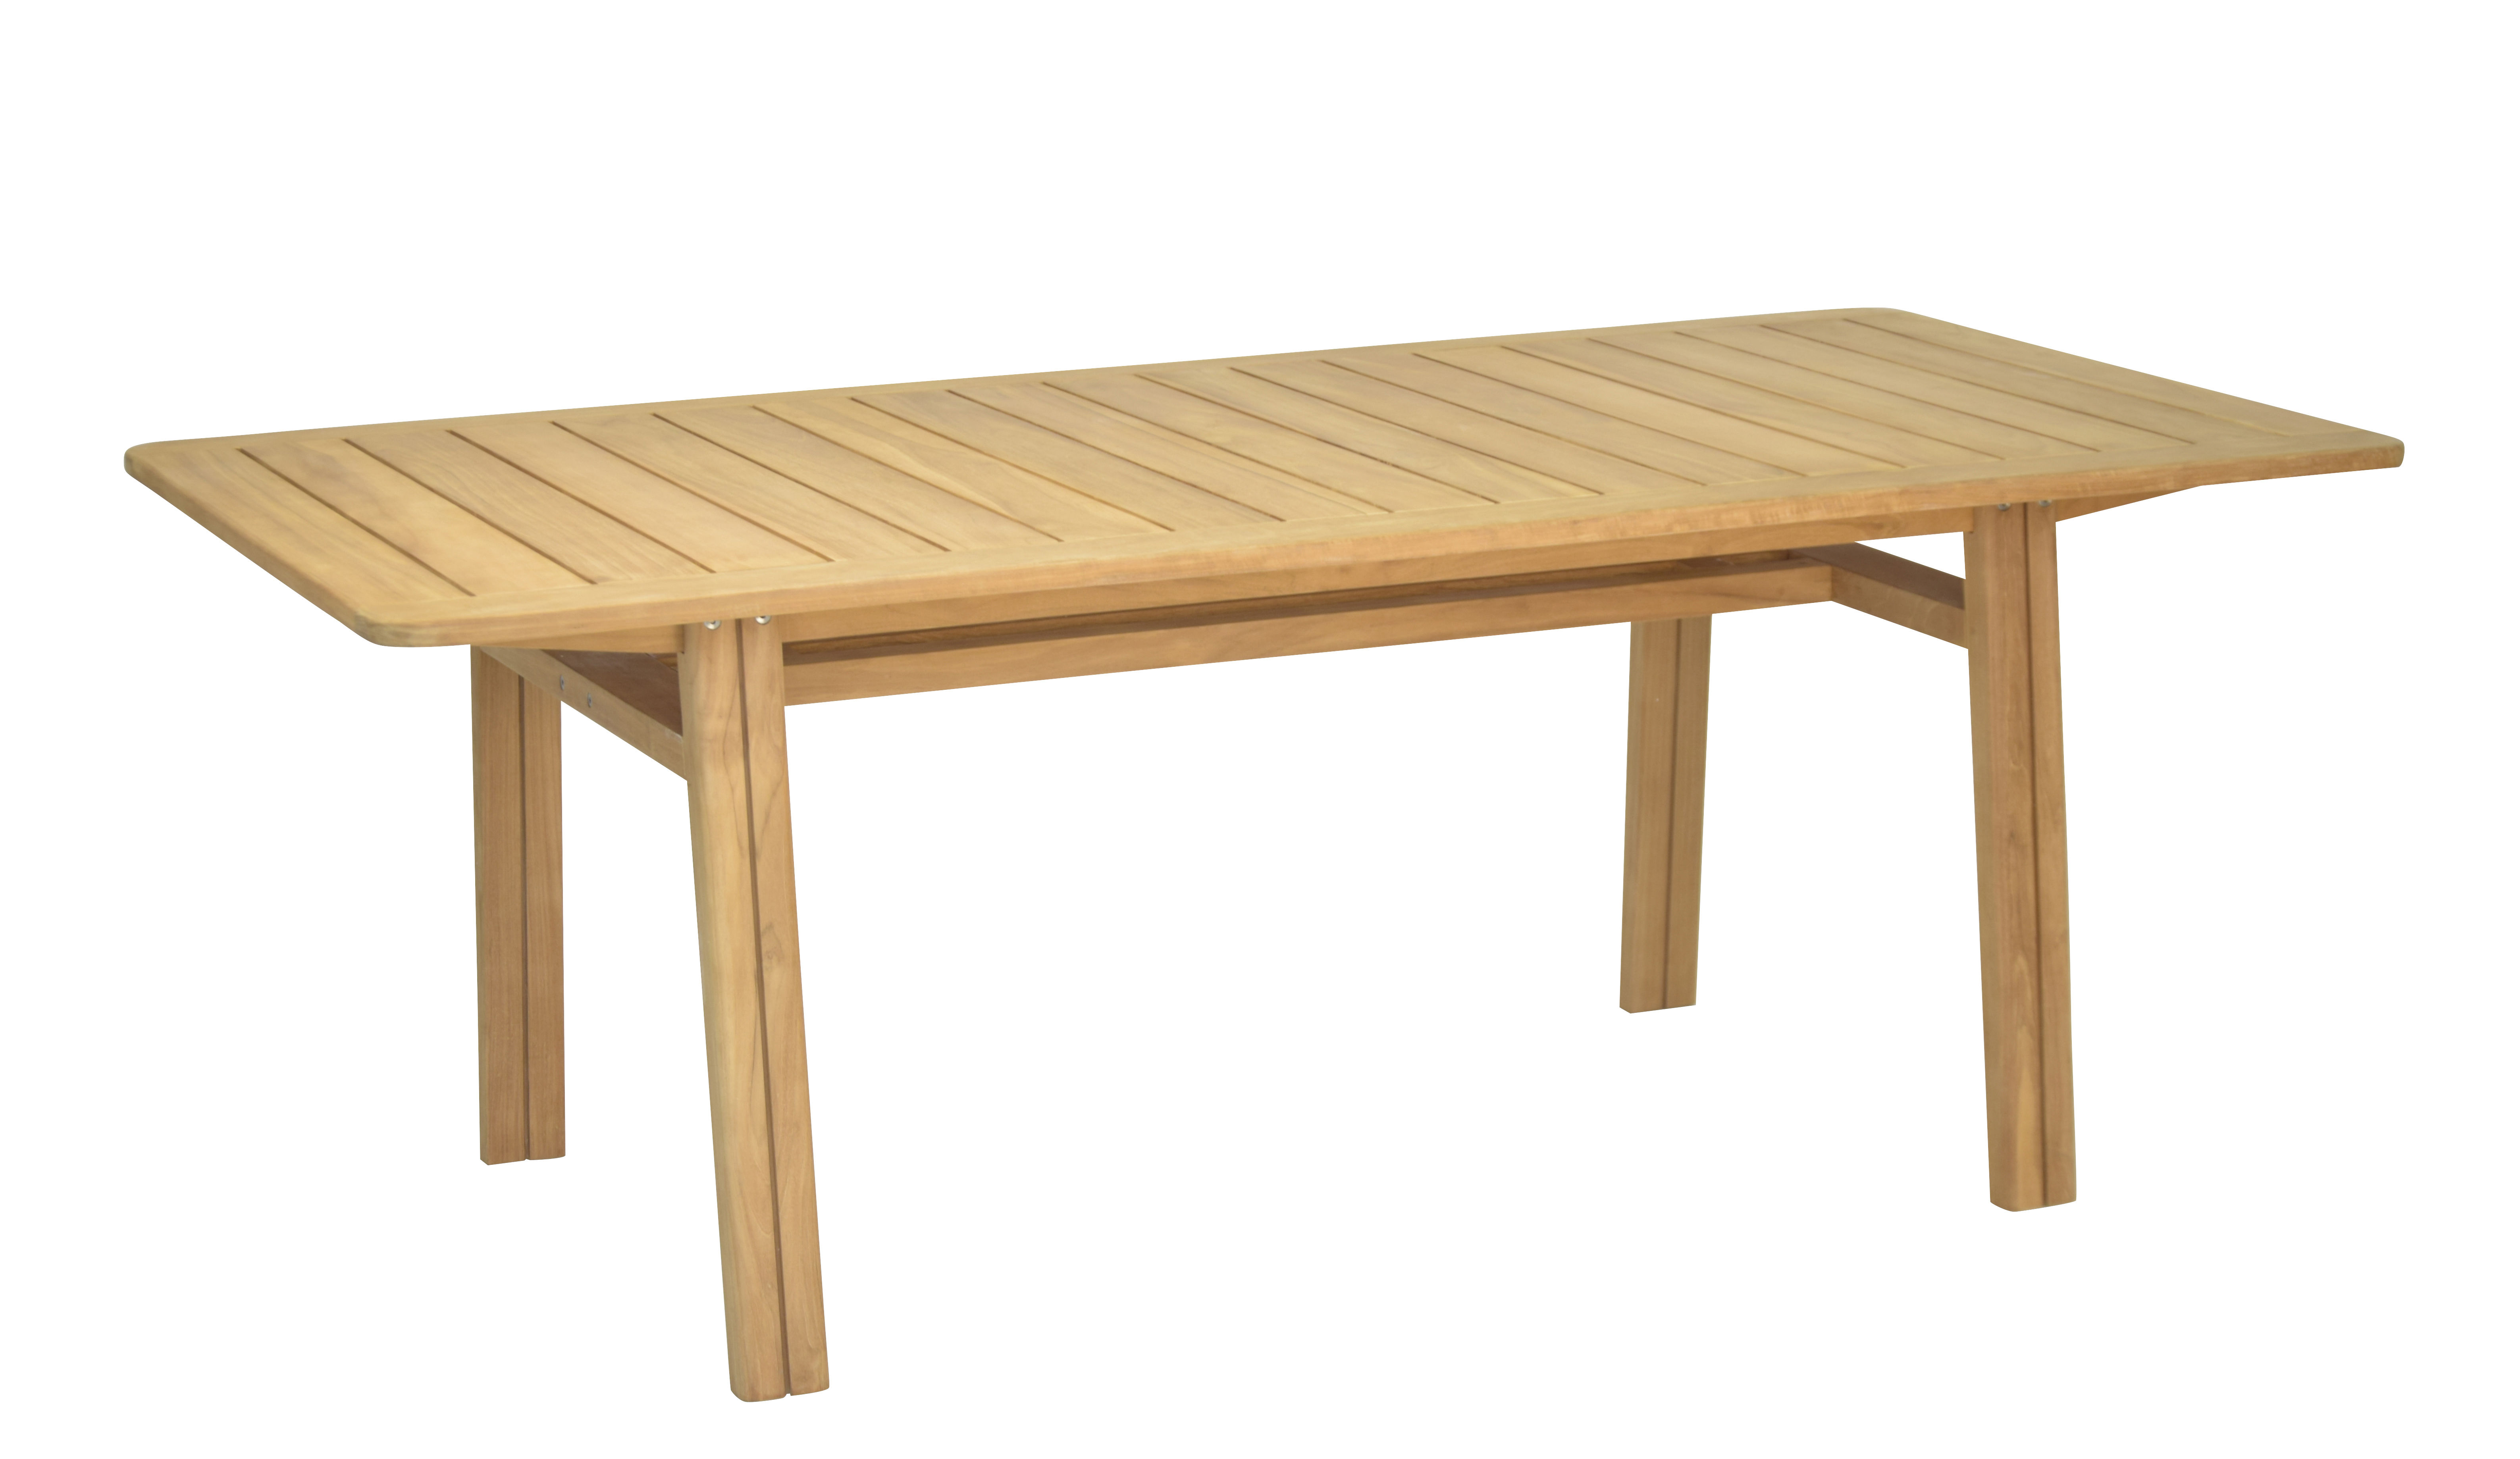 Outdoor - Tische - Lodge Table rectangulaire / Teakholz - Vlaemynck - Teak - Teck non huilé